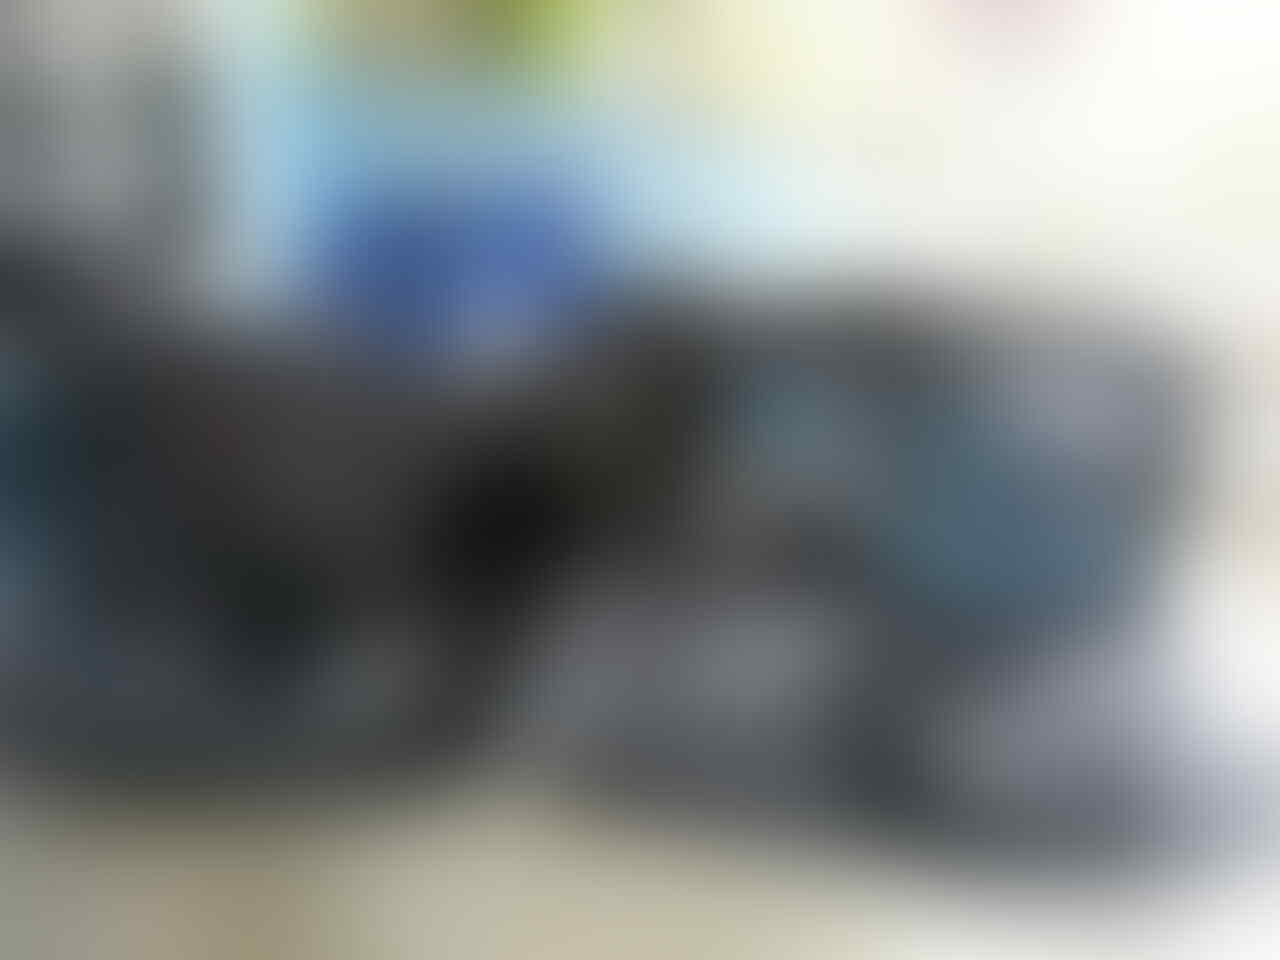 BANDITS BIKE BAG - Solusi Packing Sepeda Anda